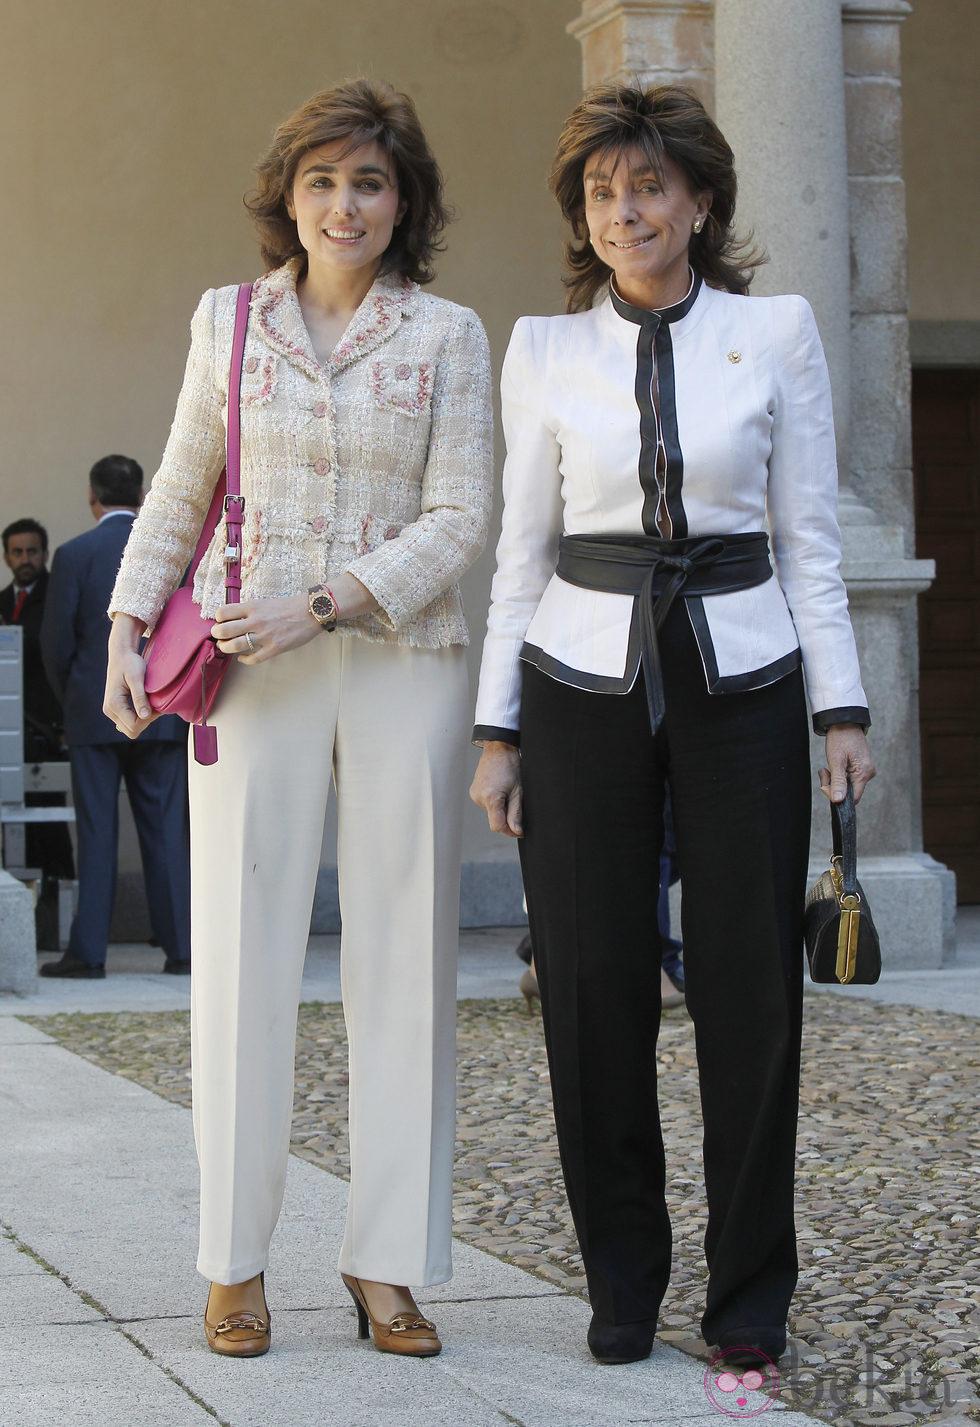 Paloma Segrelles madre e hija en la entrega del Premio Cervantes 2012